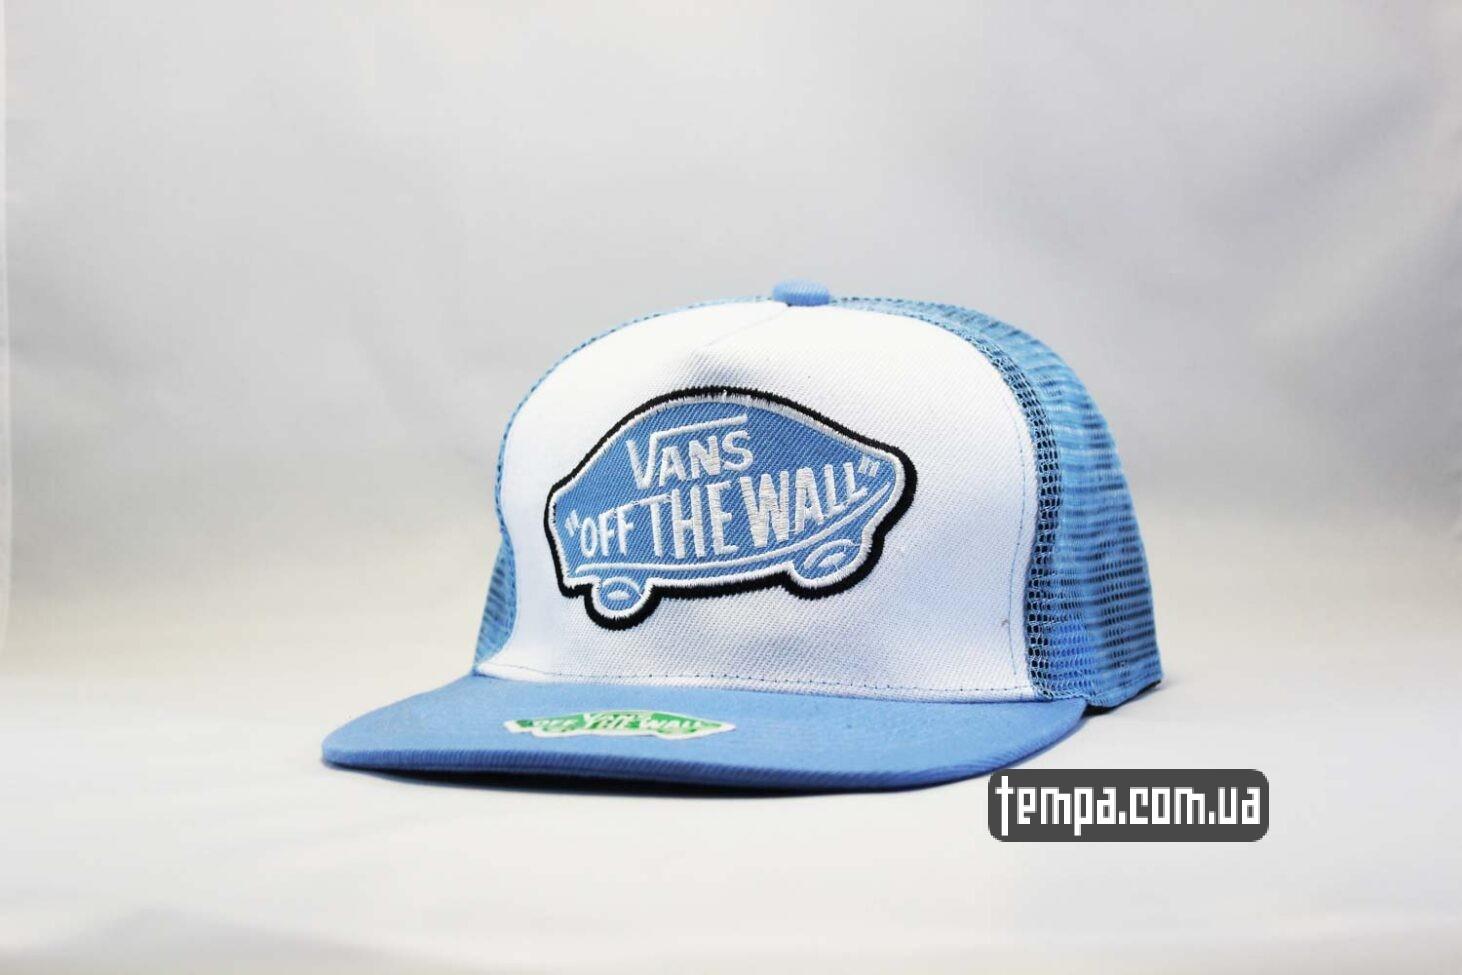 кепка trucker snapback VANS OFF THE WALL голубая с сеткой